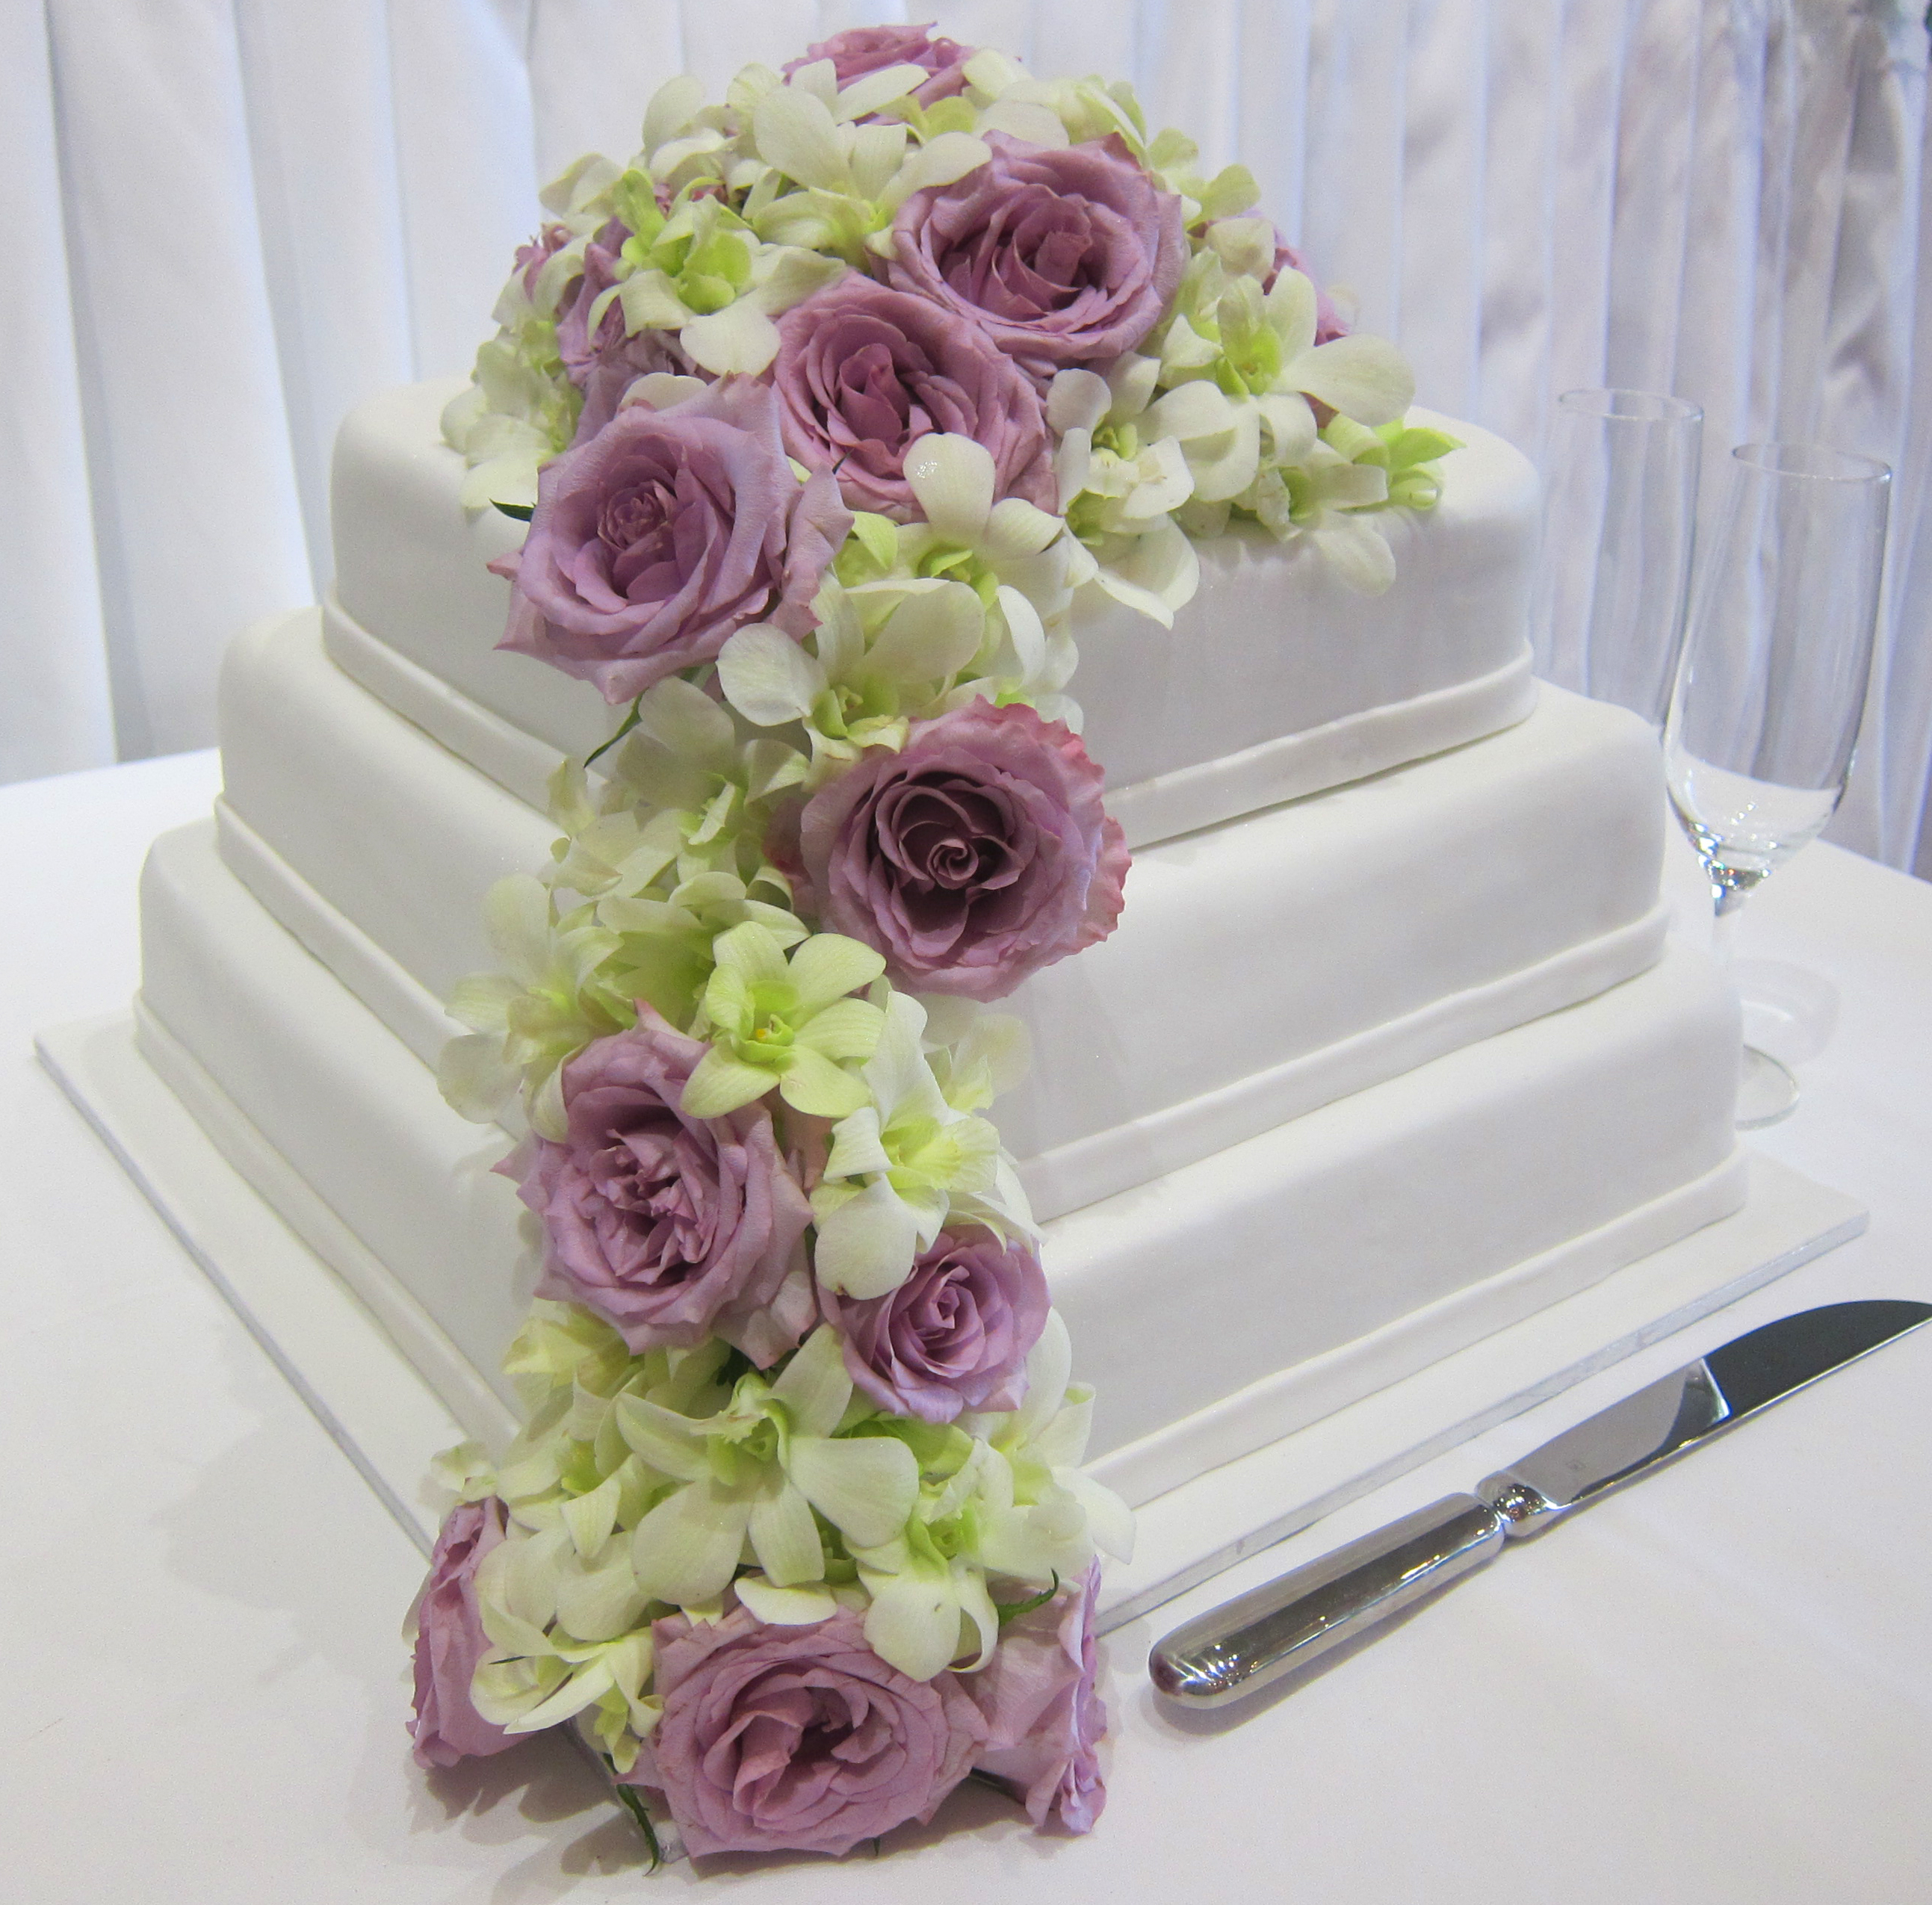 fresh flowers on wedding cakes wedding flowers 2013. Black Bedroom Furniture Sets. Home Design Ideas